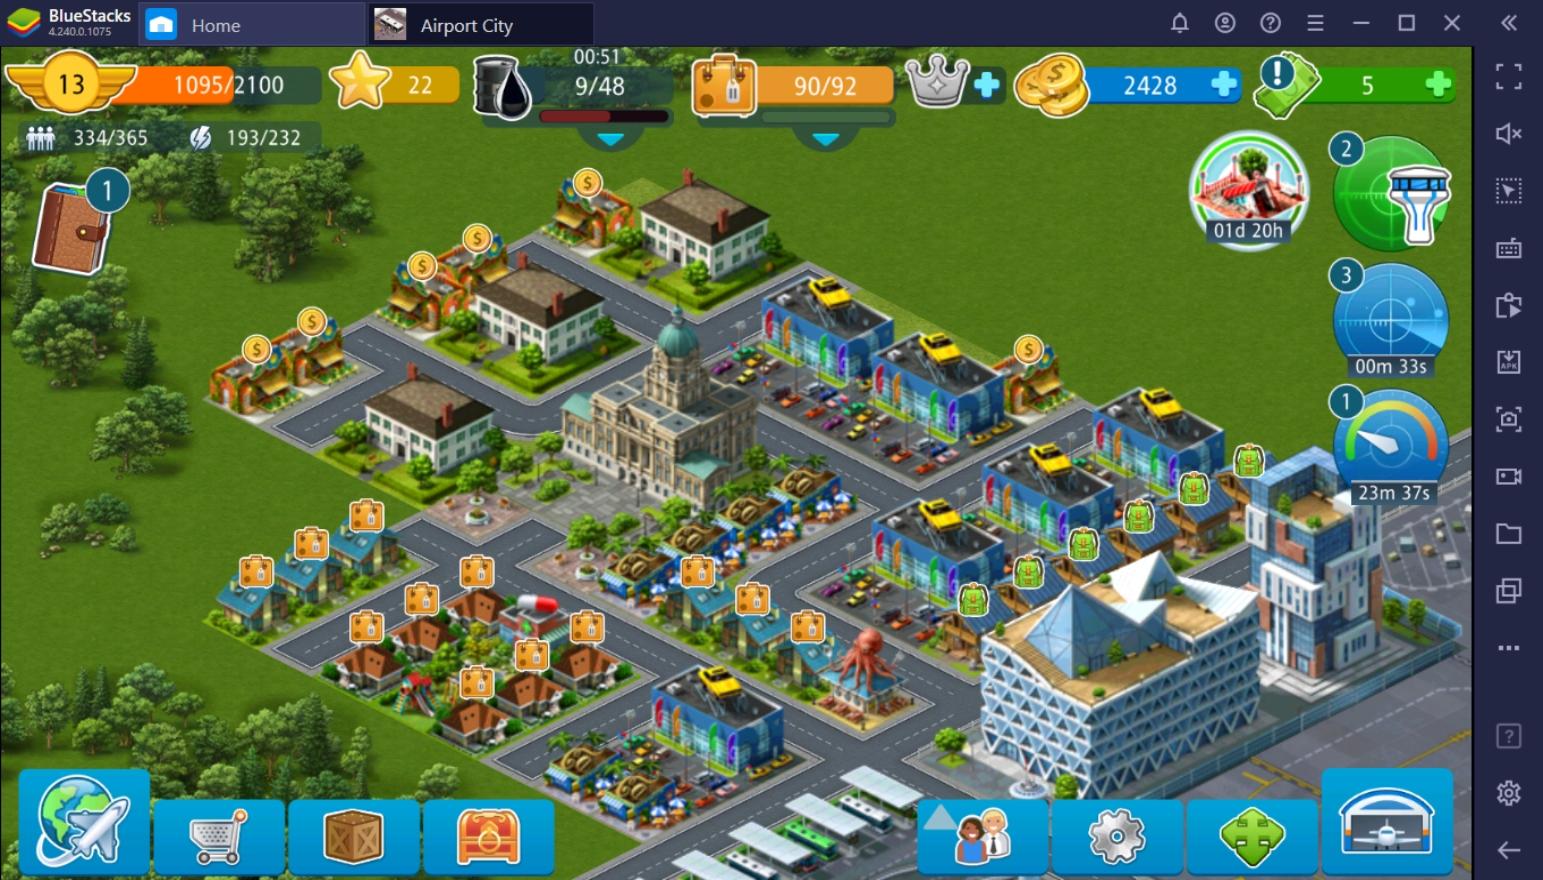 Panduan Pemula untuk Memainkan Airport City di PC